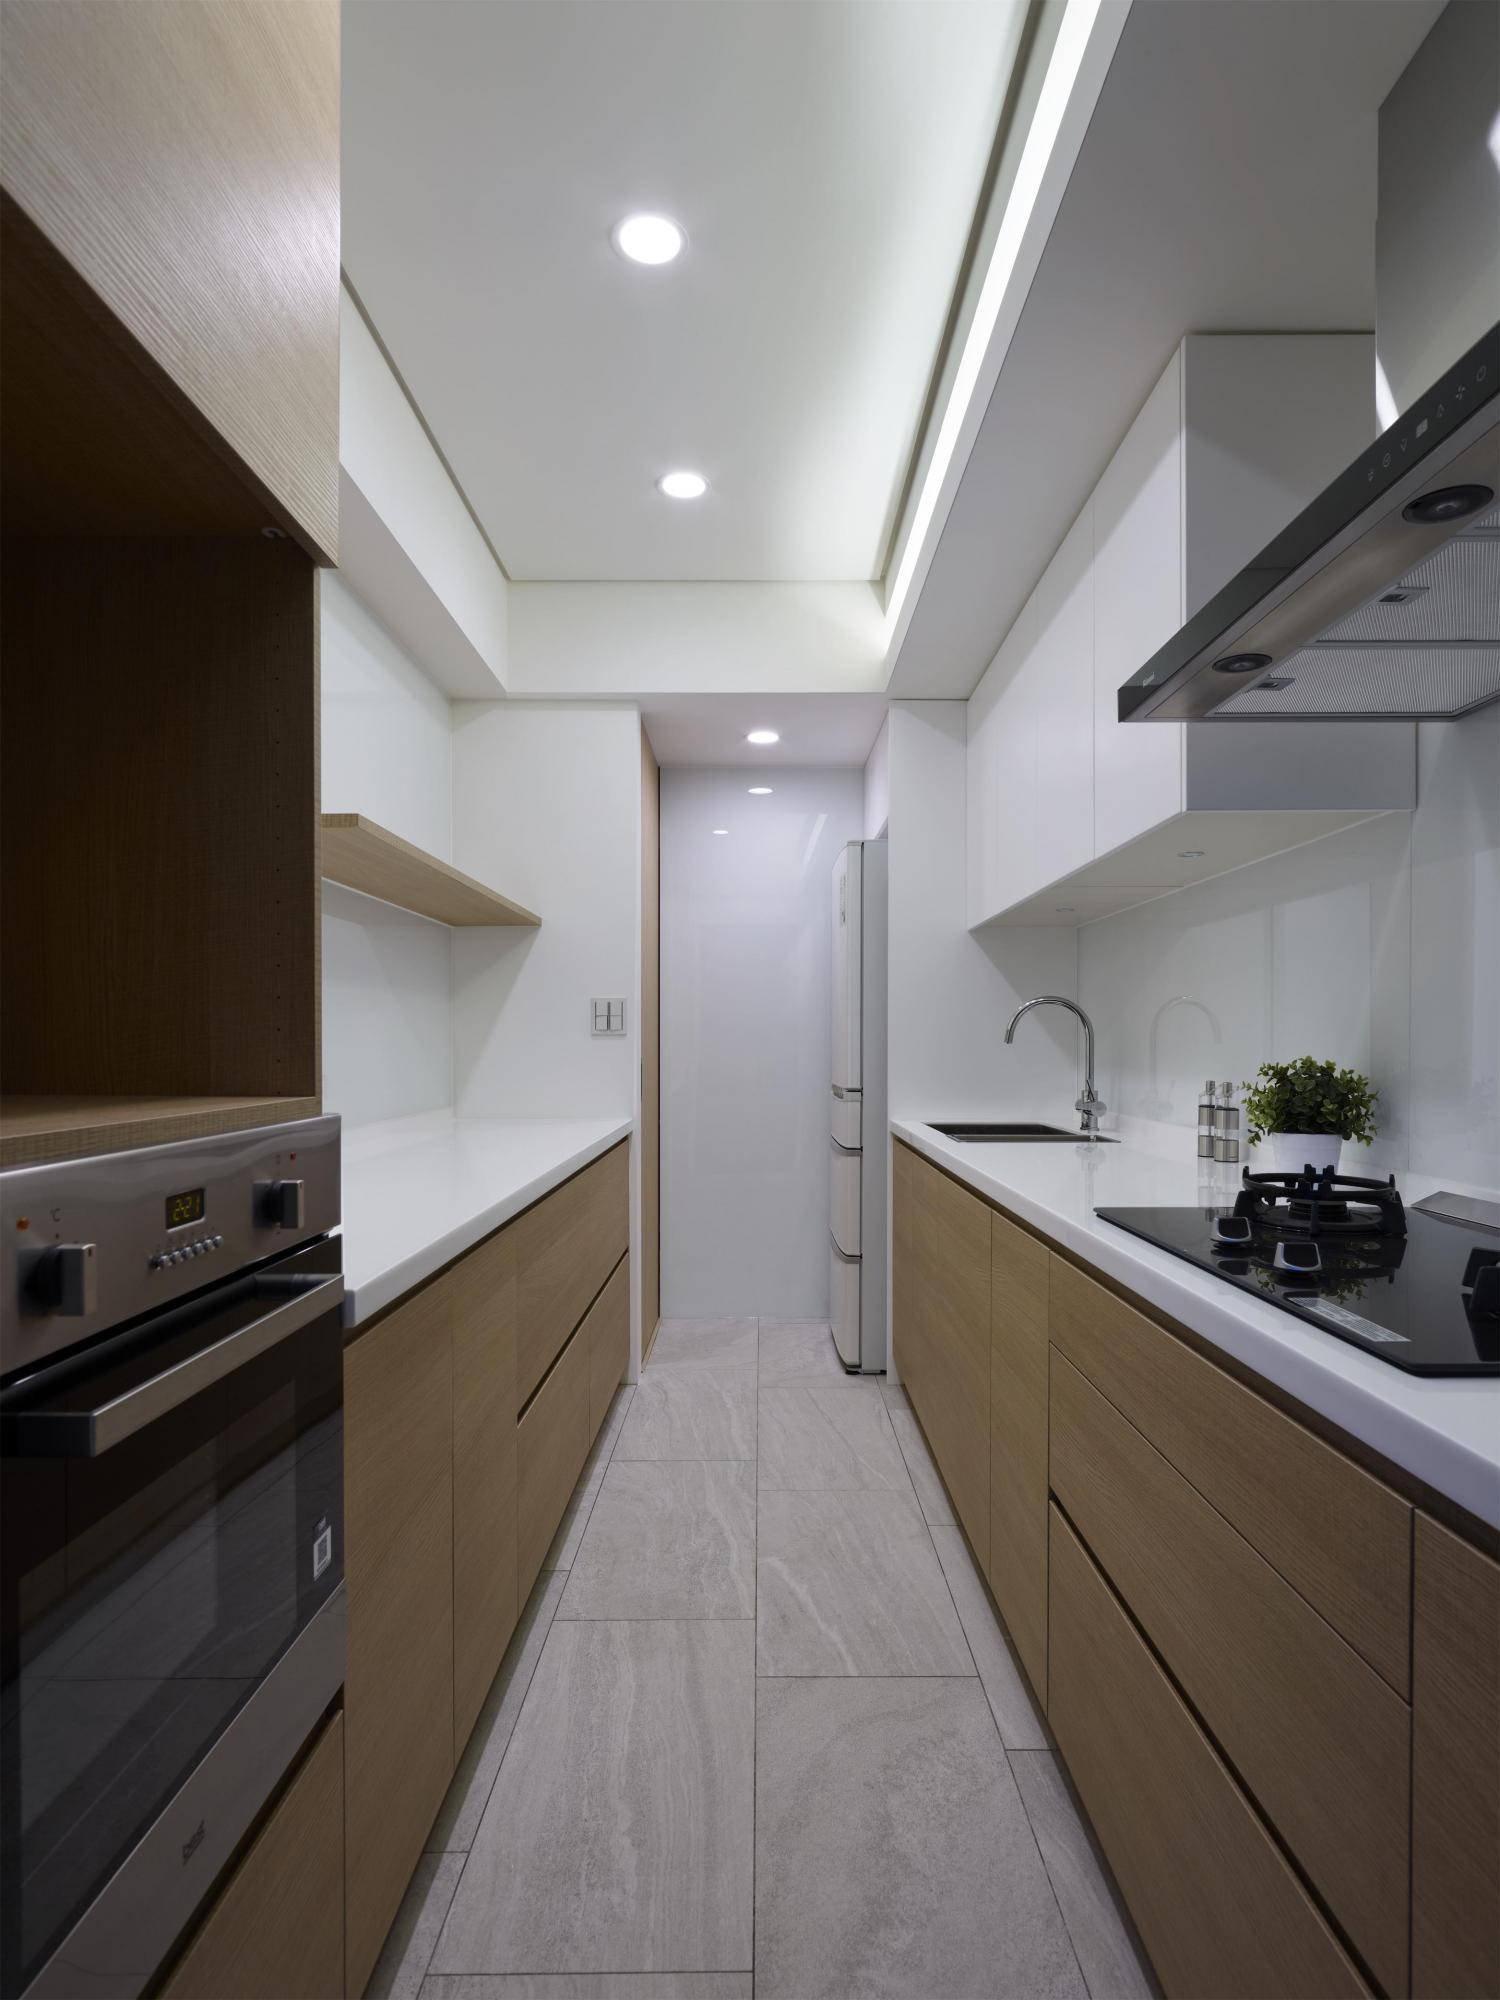 Interior Image 328